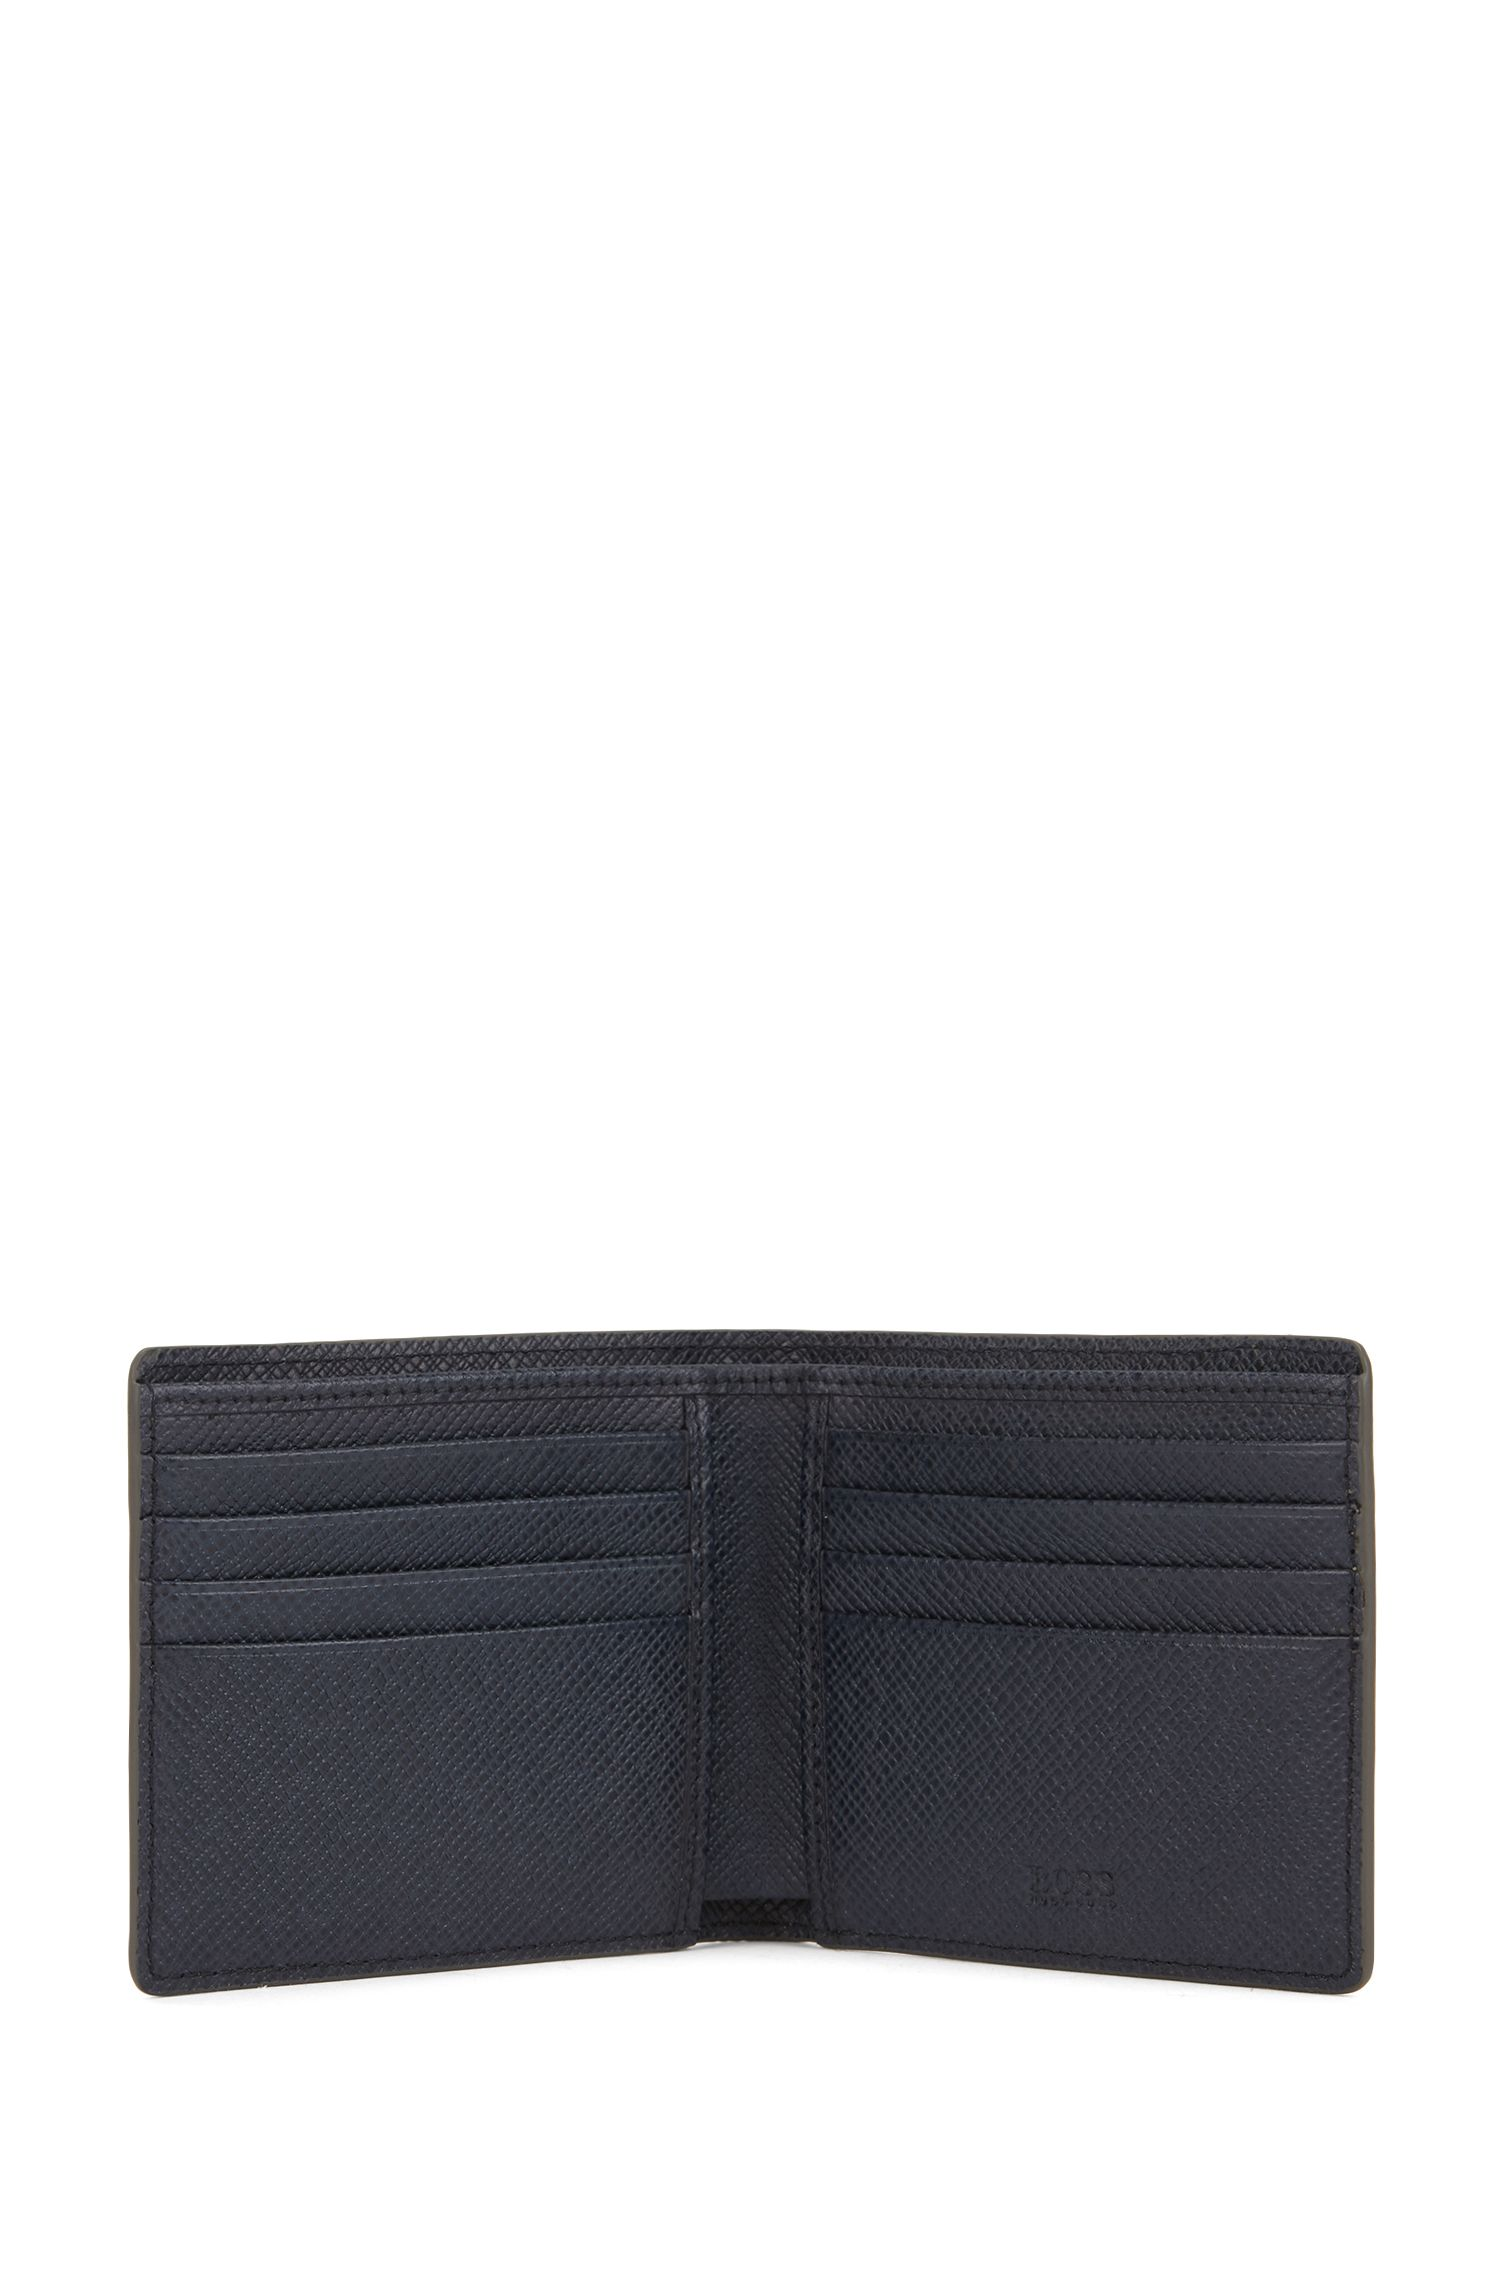 Portemonnaie aus strukturiertem Leder: 'Signature_4cc coin B'